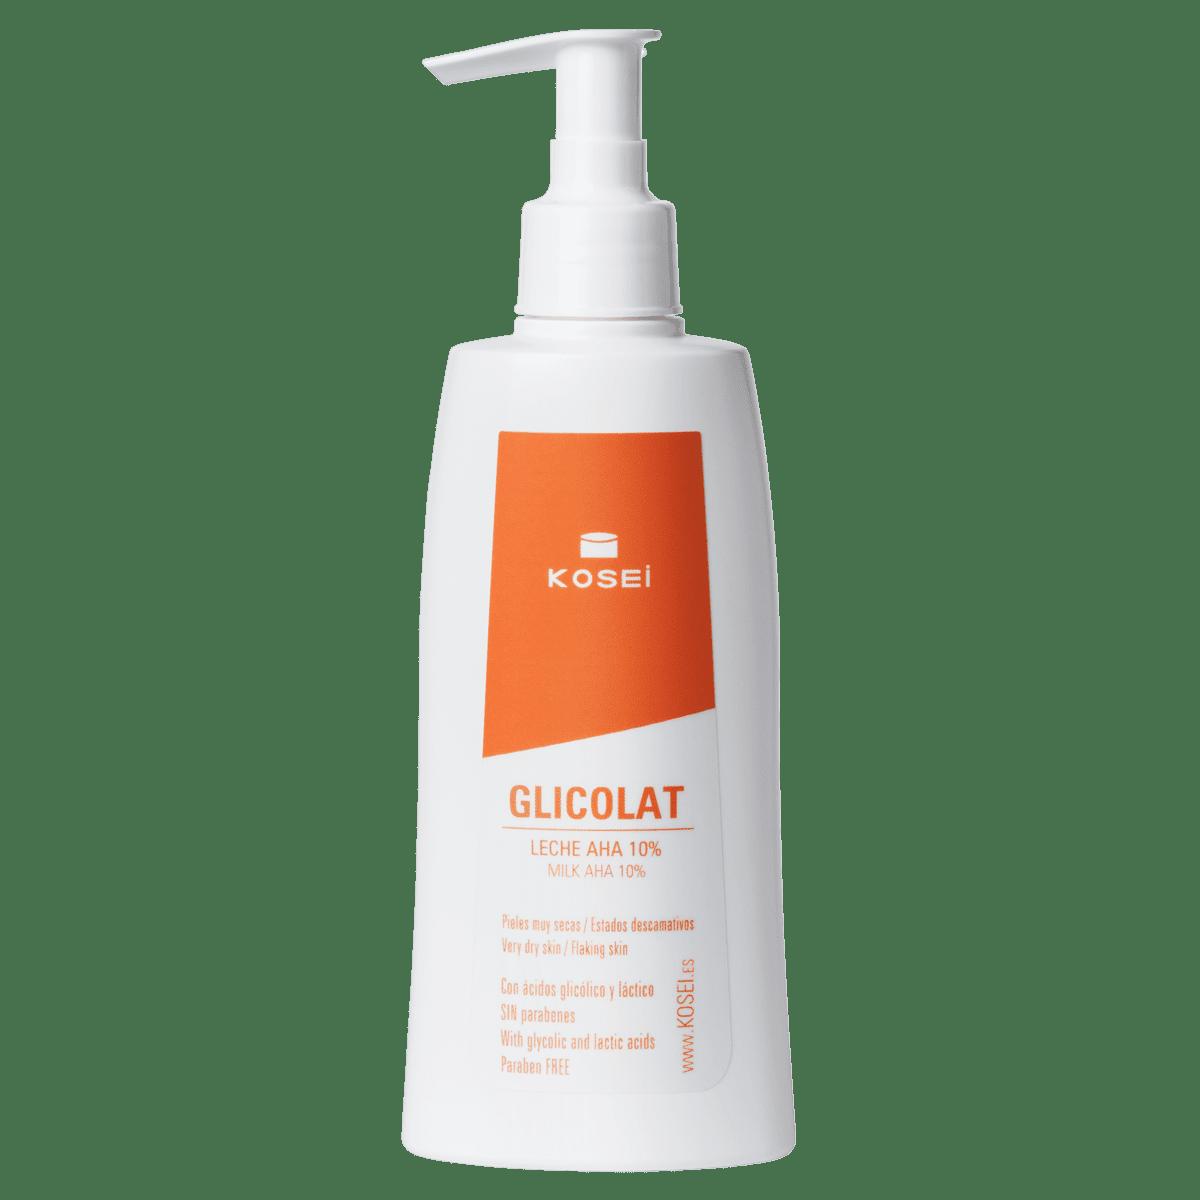 GLICOLAT Leche AHA 10%. Crema hidratante piel seca